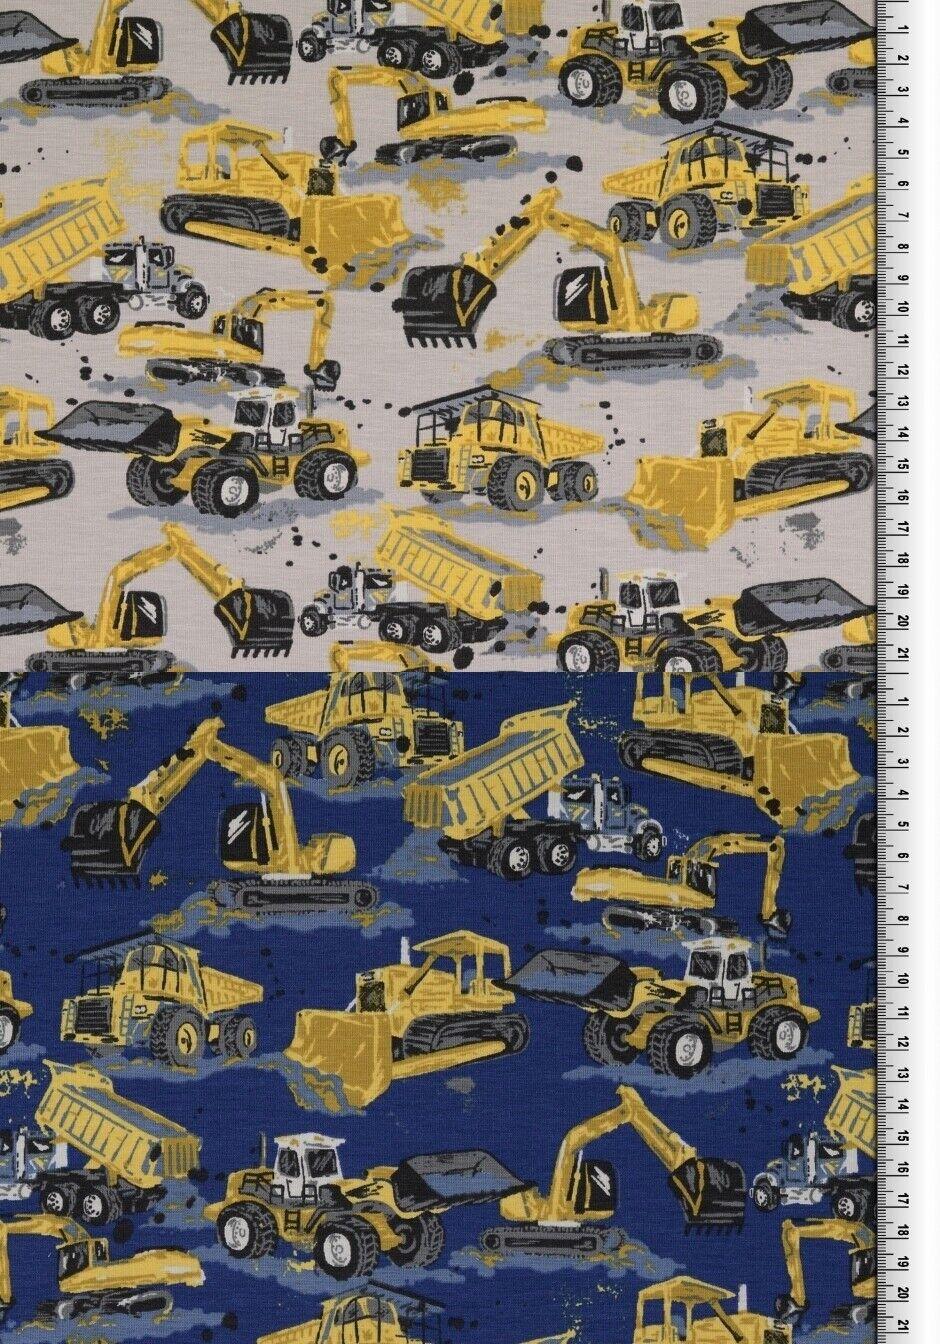 Bagger Stoff Jersey Elastisch Digitaldruck Kinderstoff Baufahrzeuge Jungen NEU!